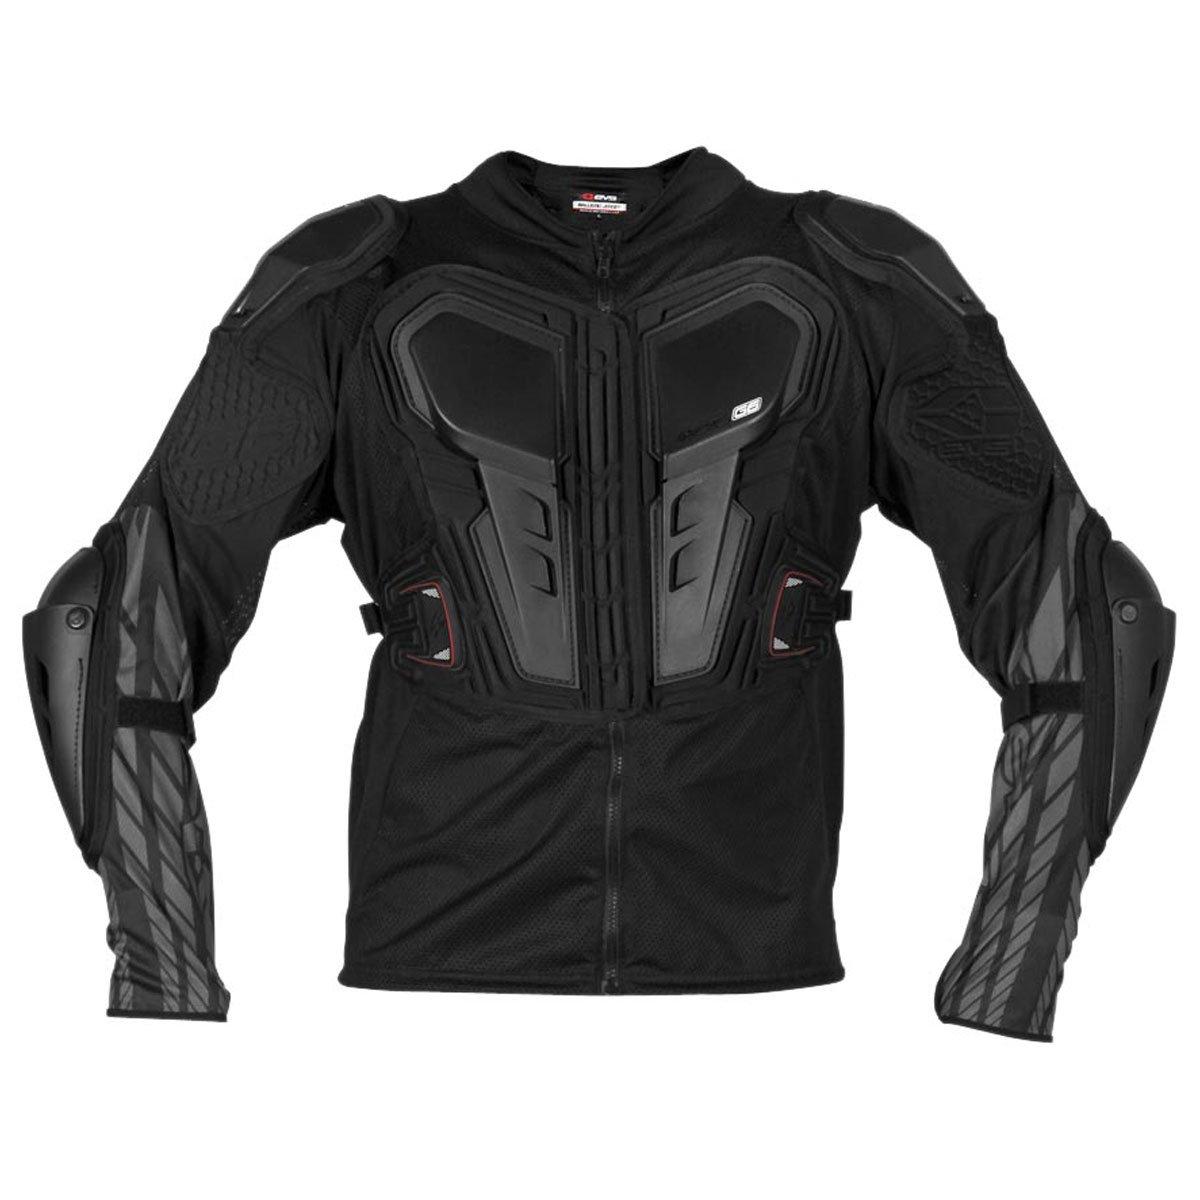 EVS Sports G6 Lite Ballistic Jersey (Black, XX-Large)